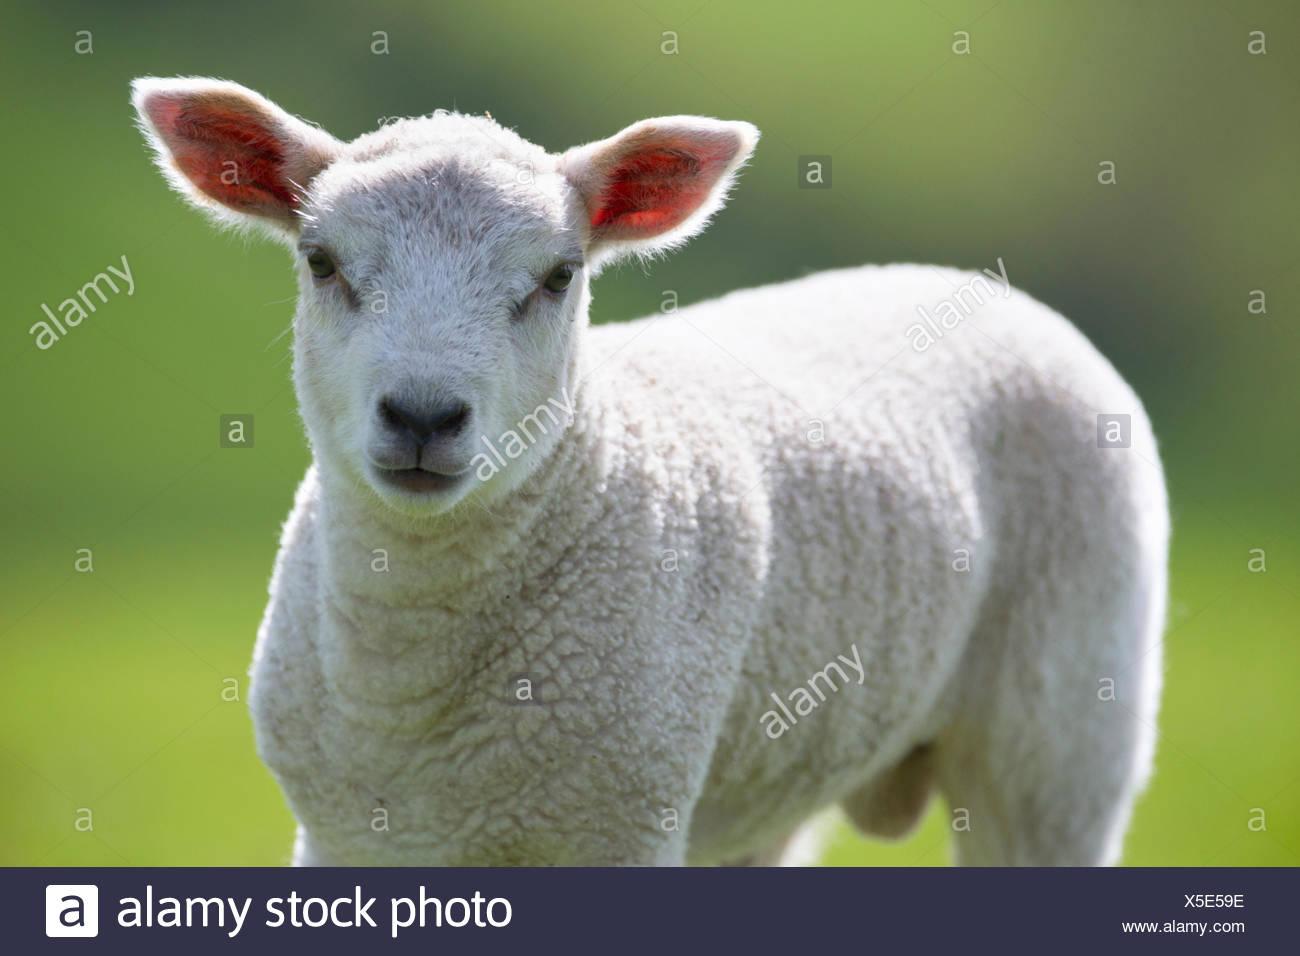 Close up portrait of lamb - Stock Image